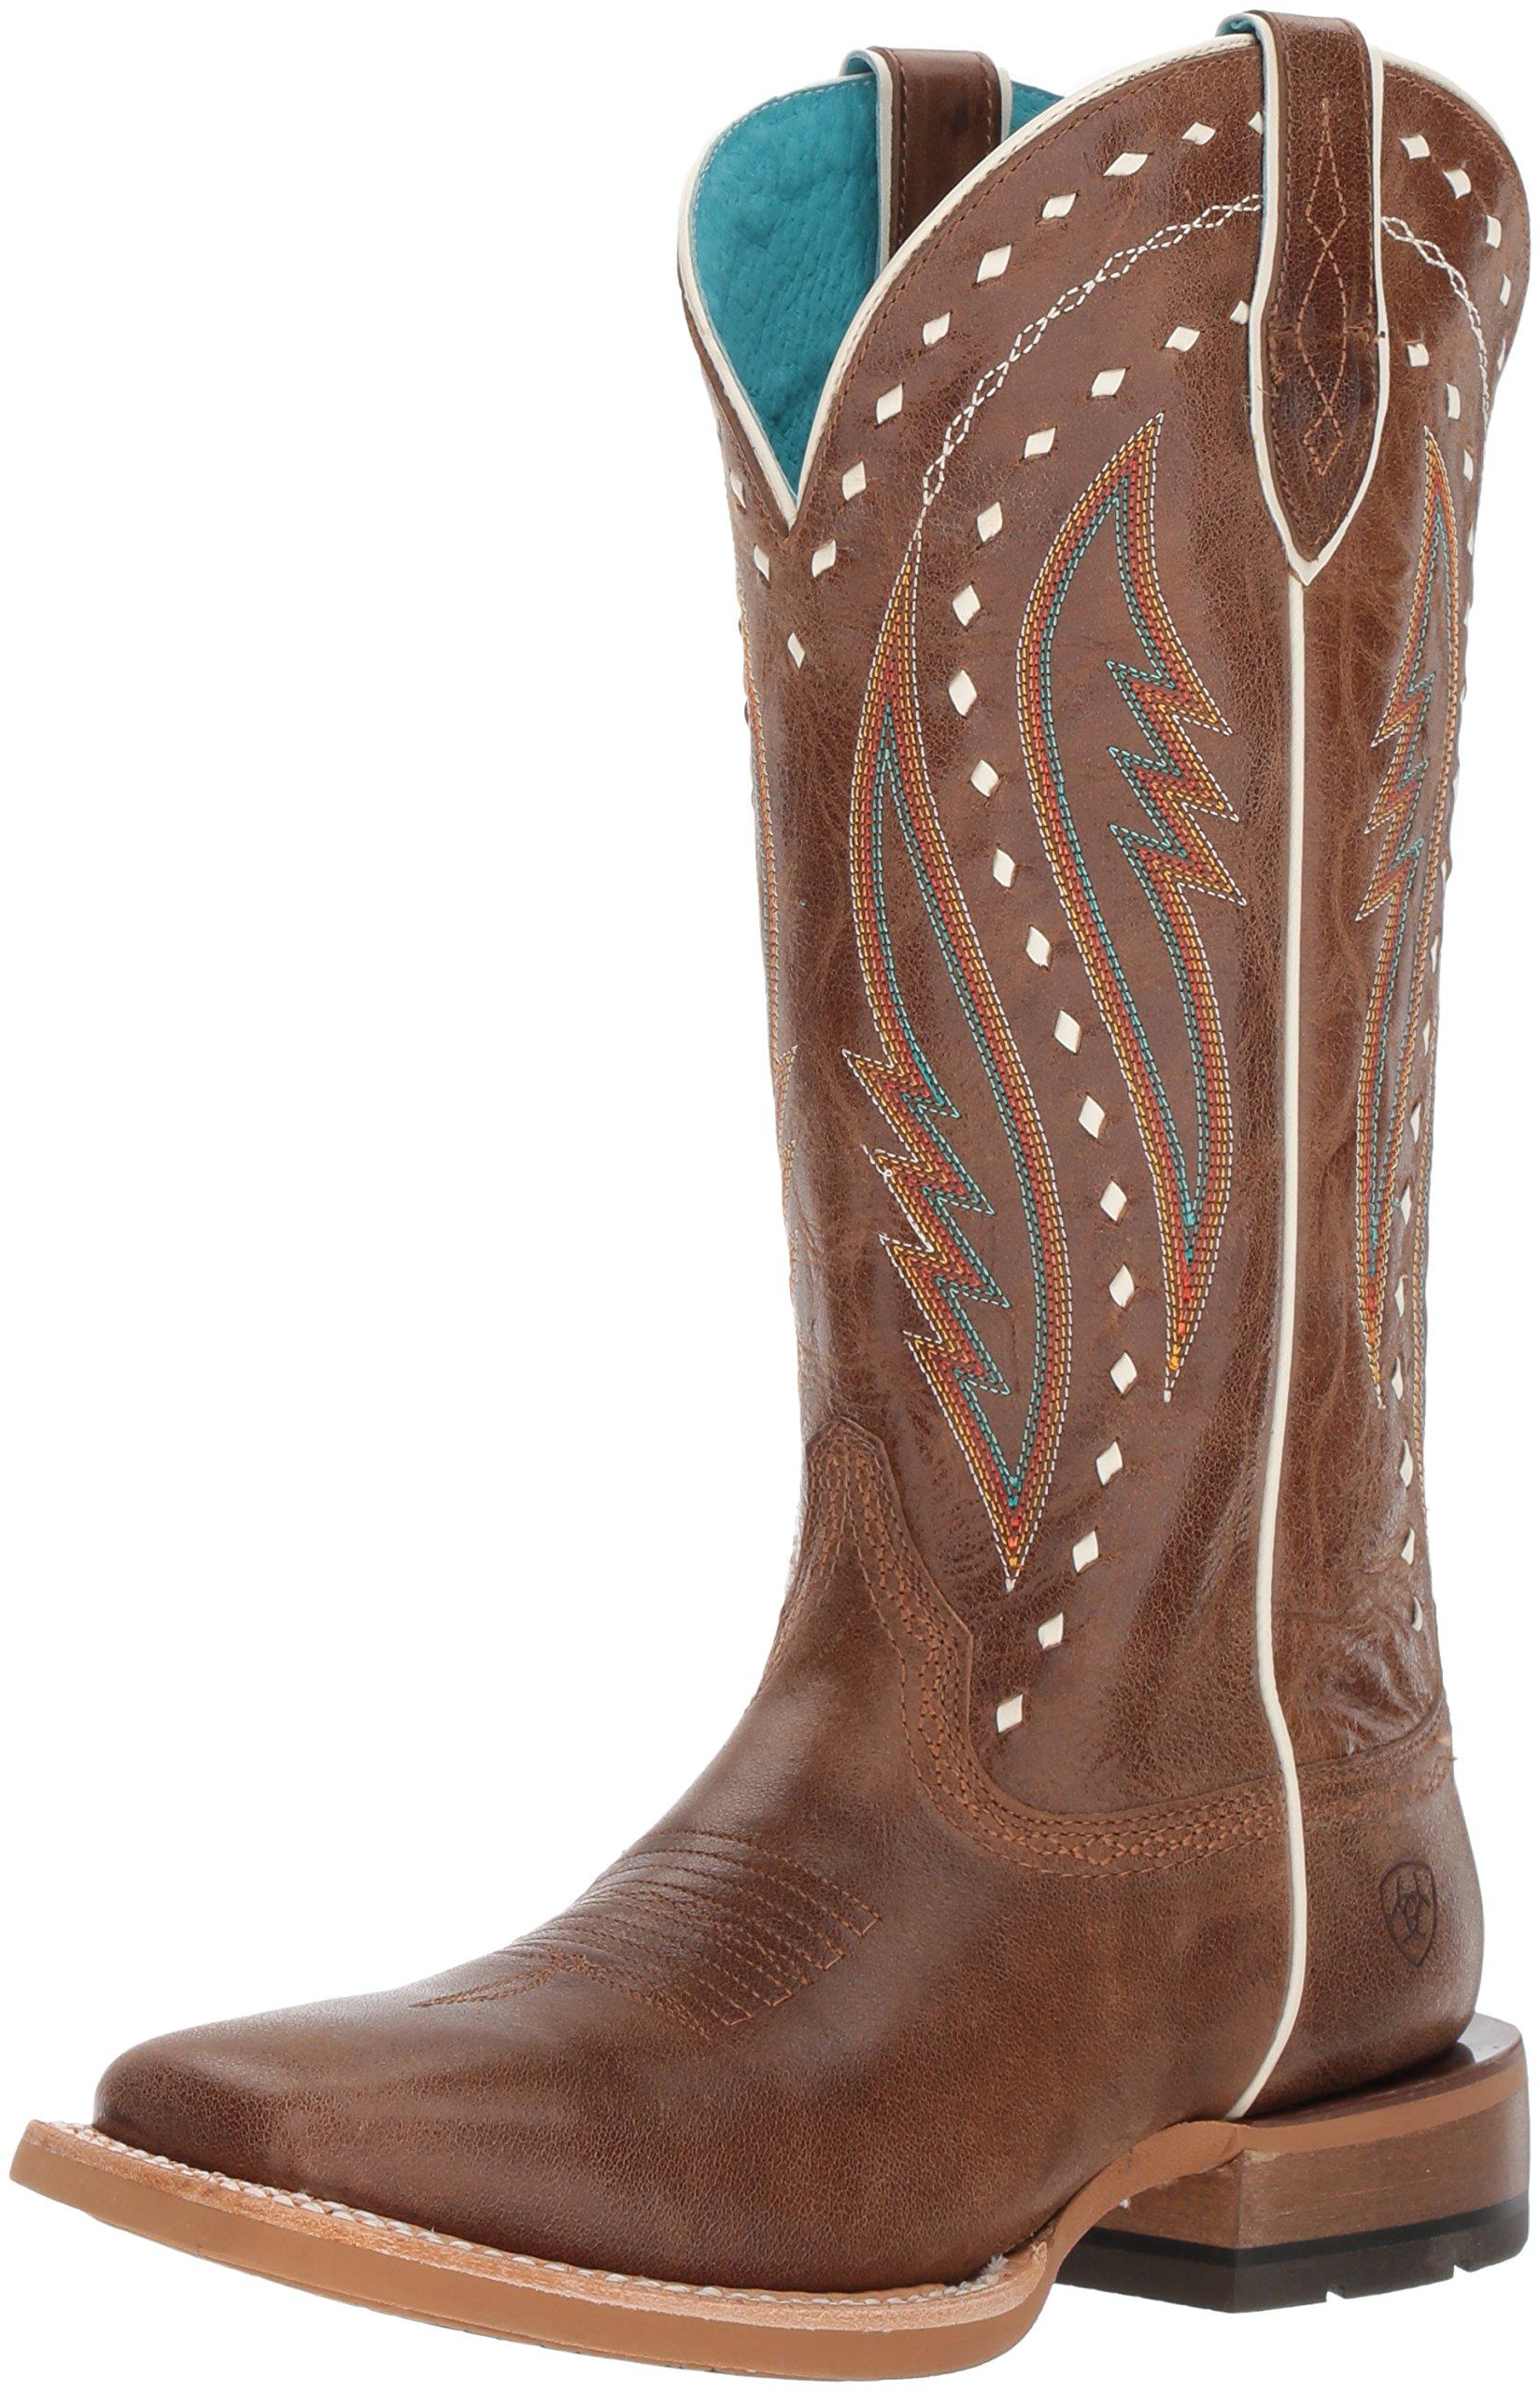 Ariat Women's Callahan Work Boot, Ranch Tan, 6 B US